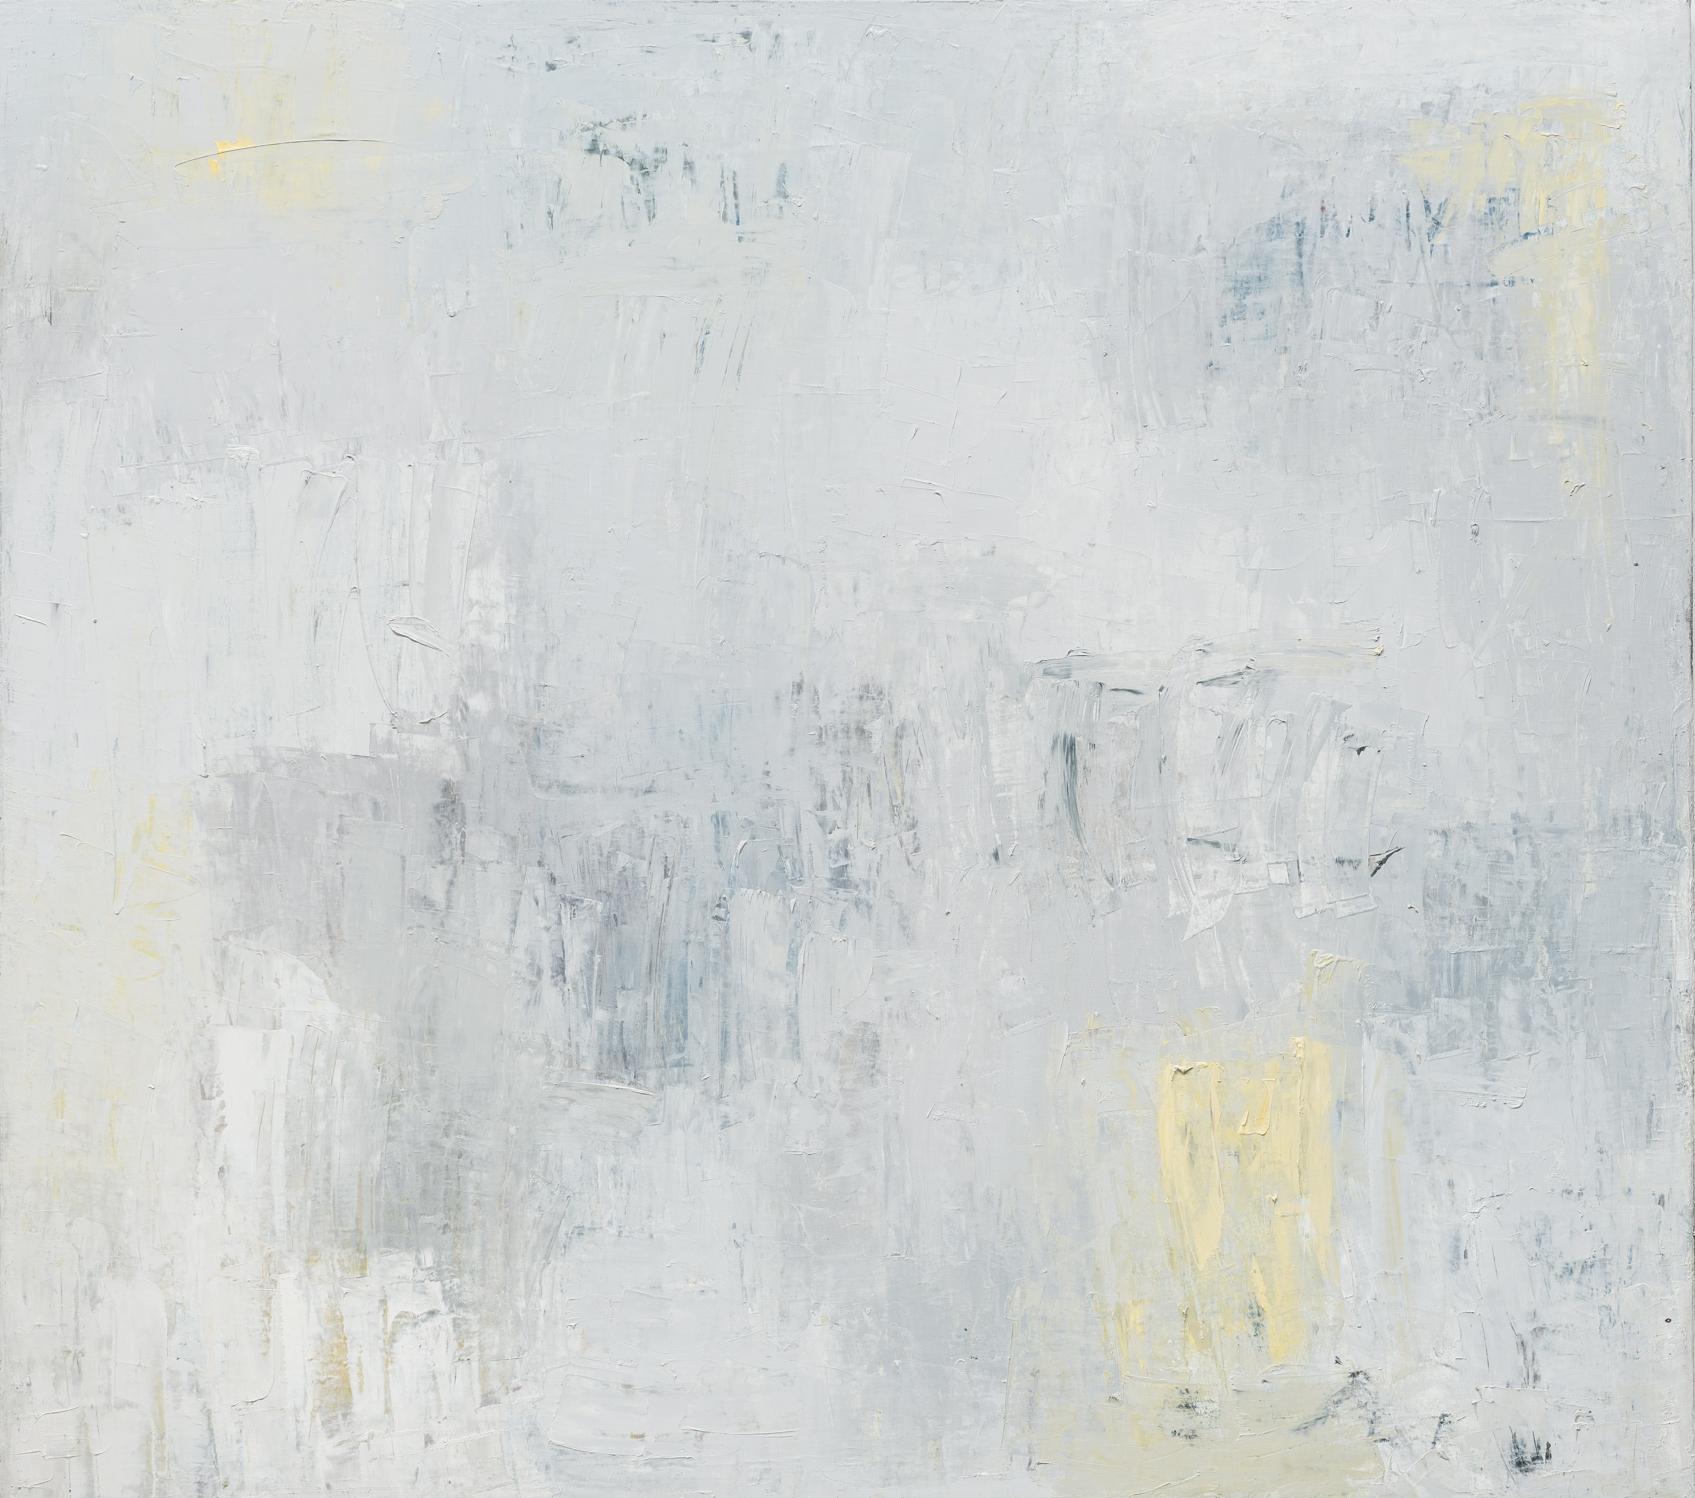 Untitled (yellow/grey)